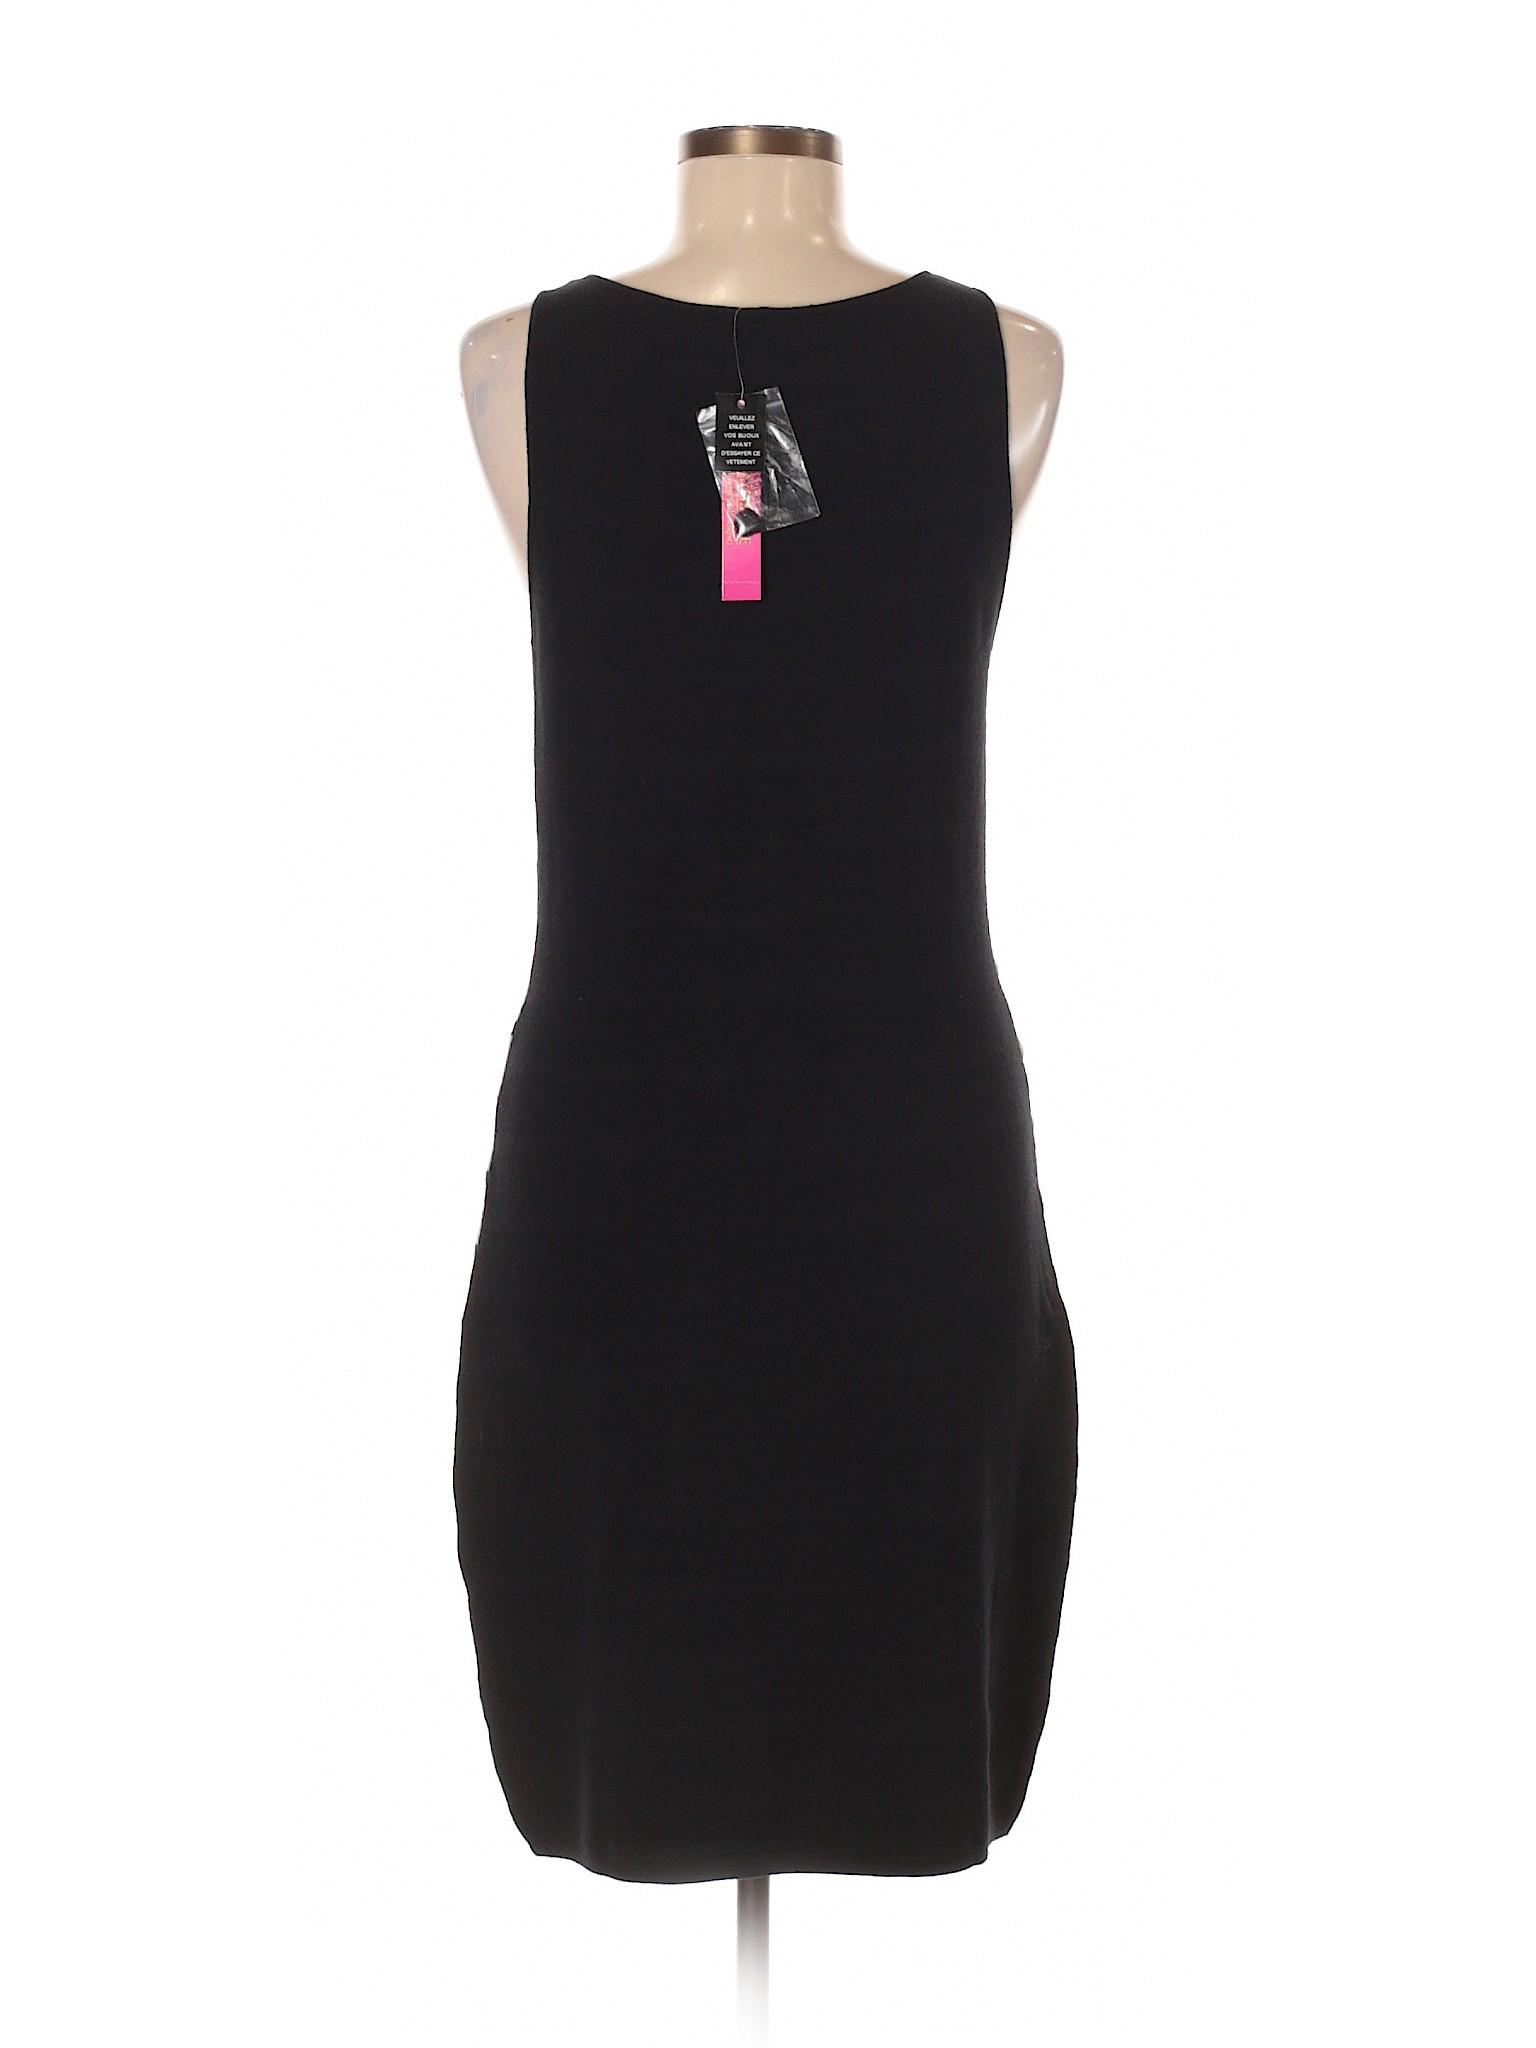 Dress winter Boutique Malandrino CATHERINE Catherine Casual wXdxtdqr6